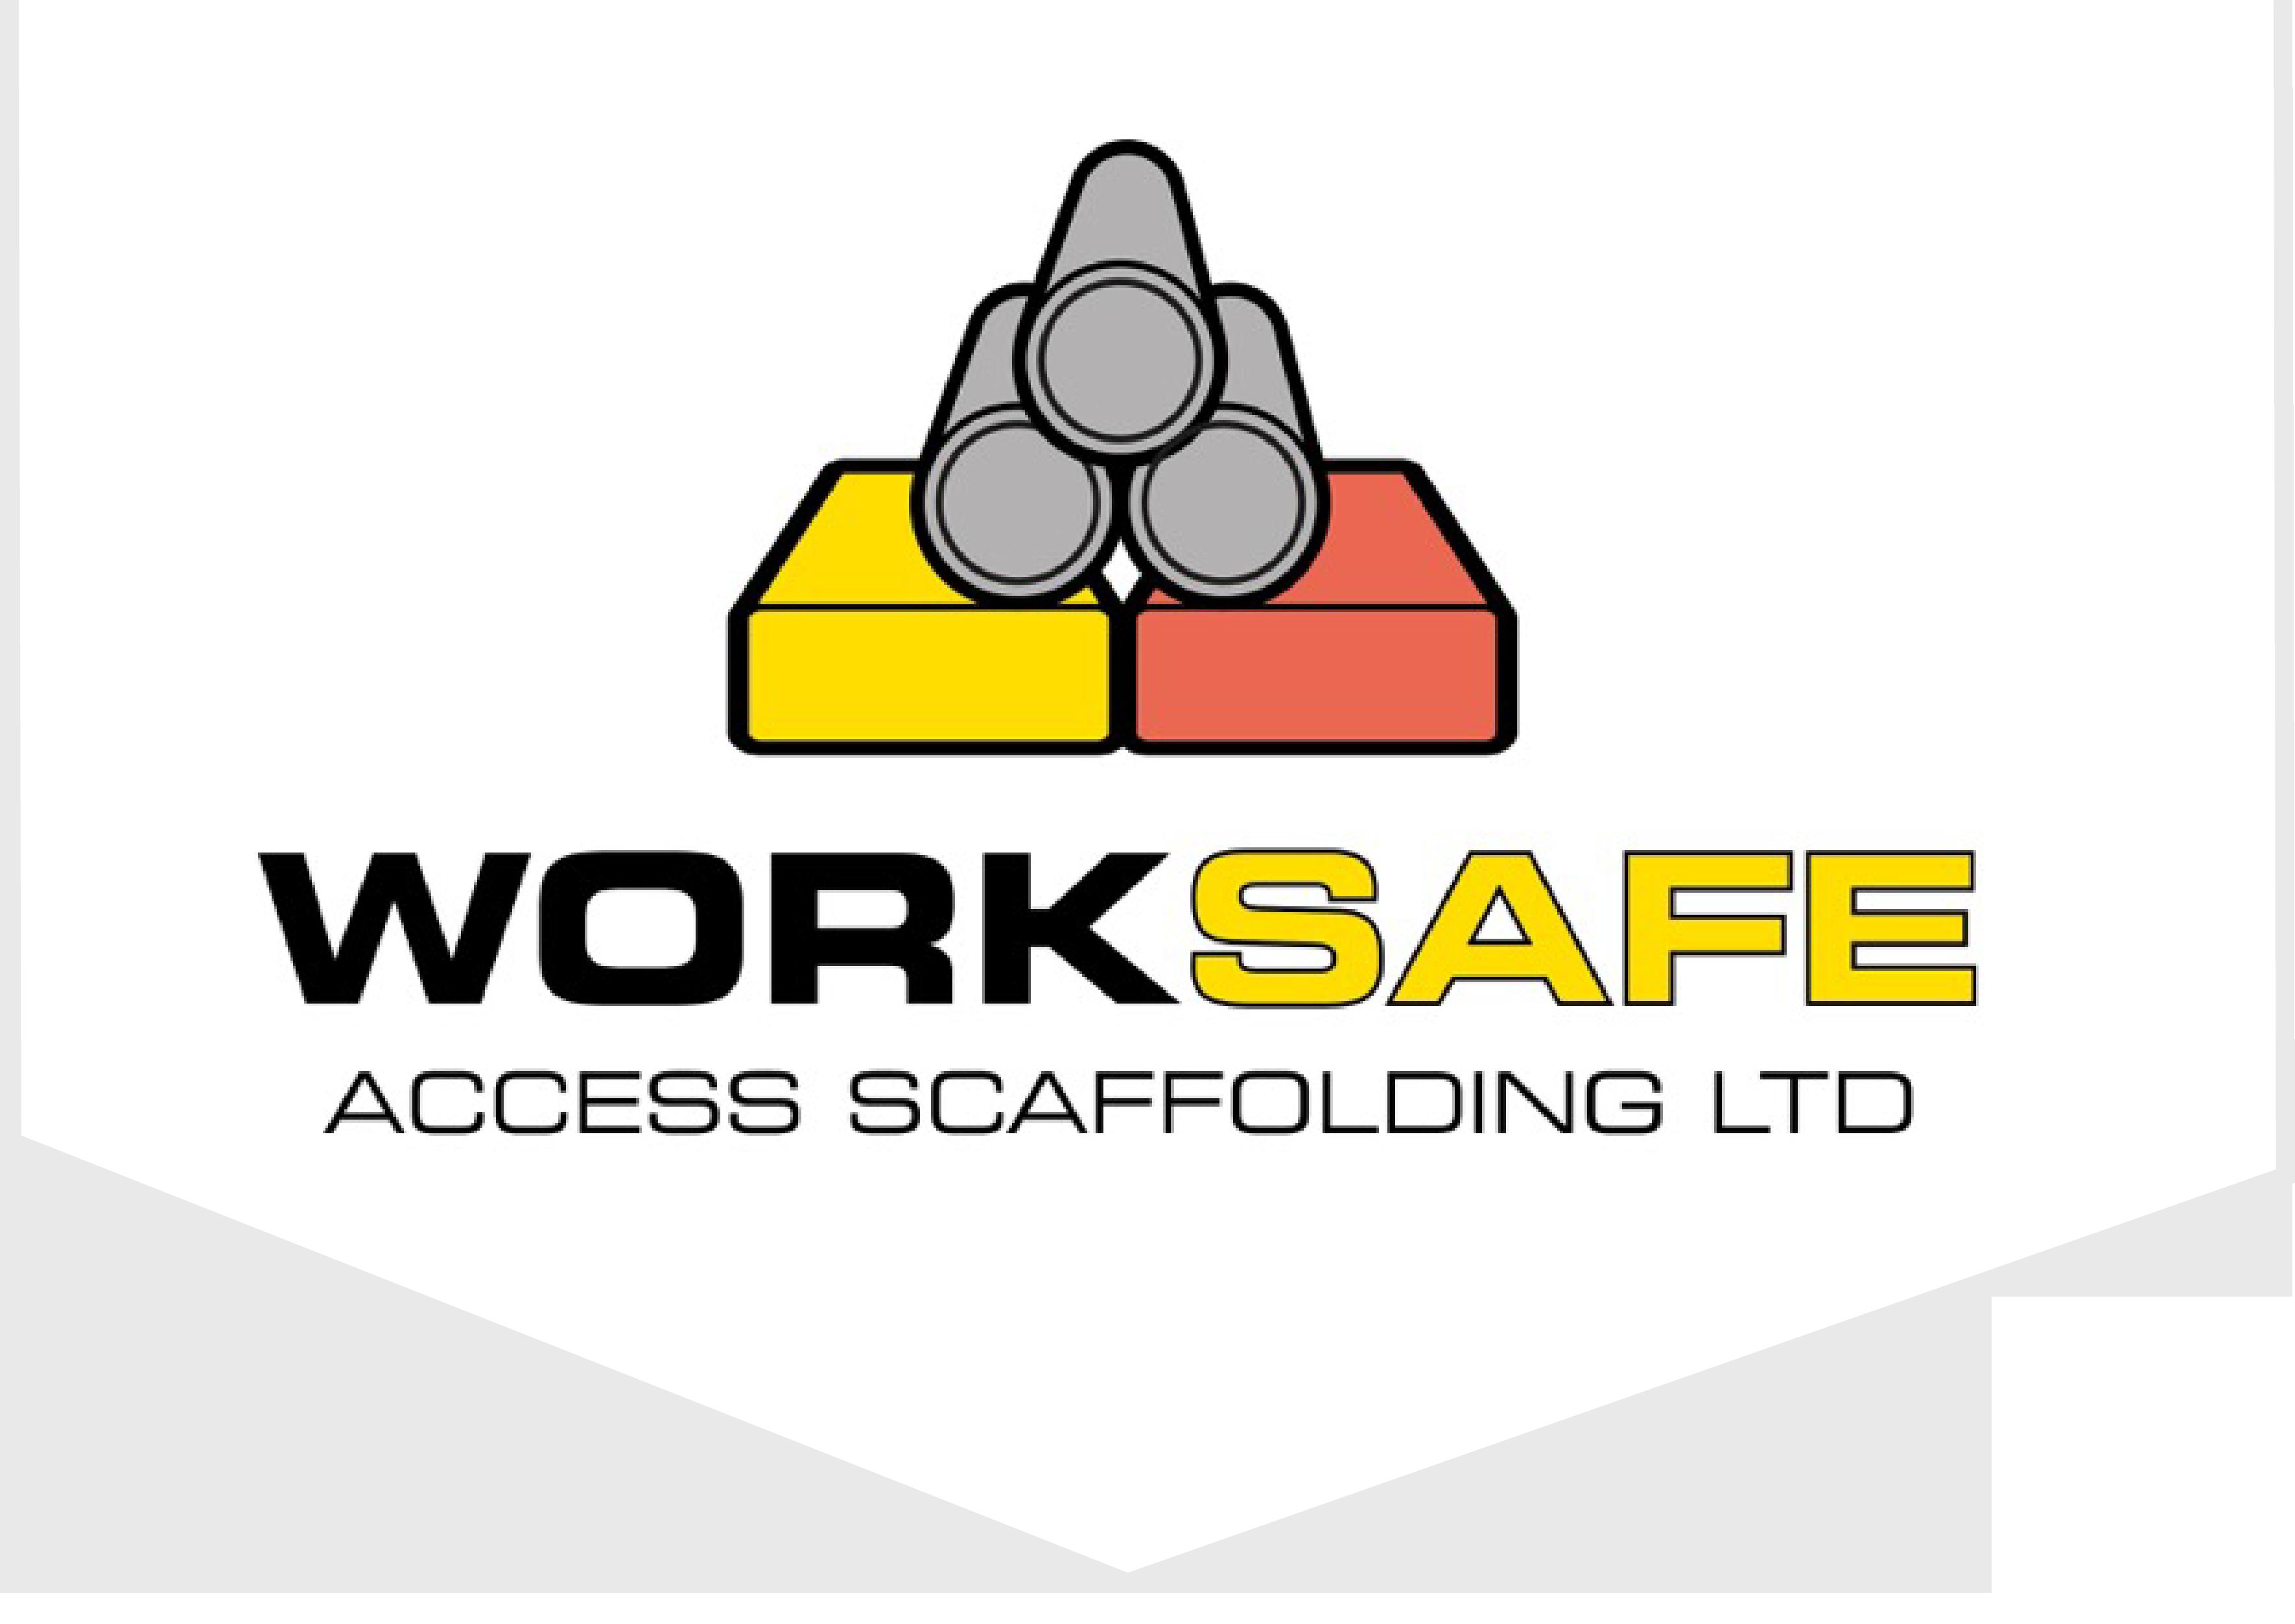 Worksafe Access Scaffolding Ltd